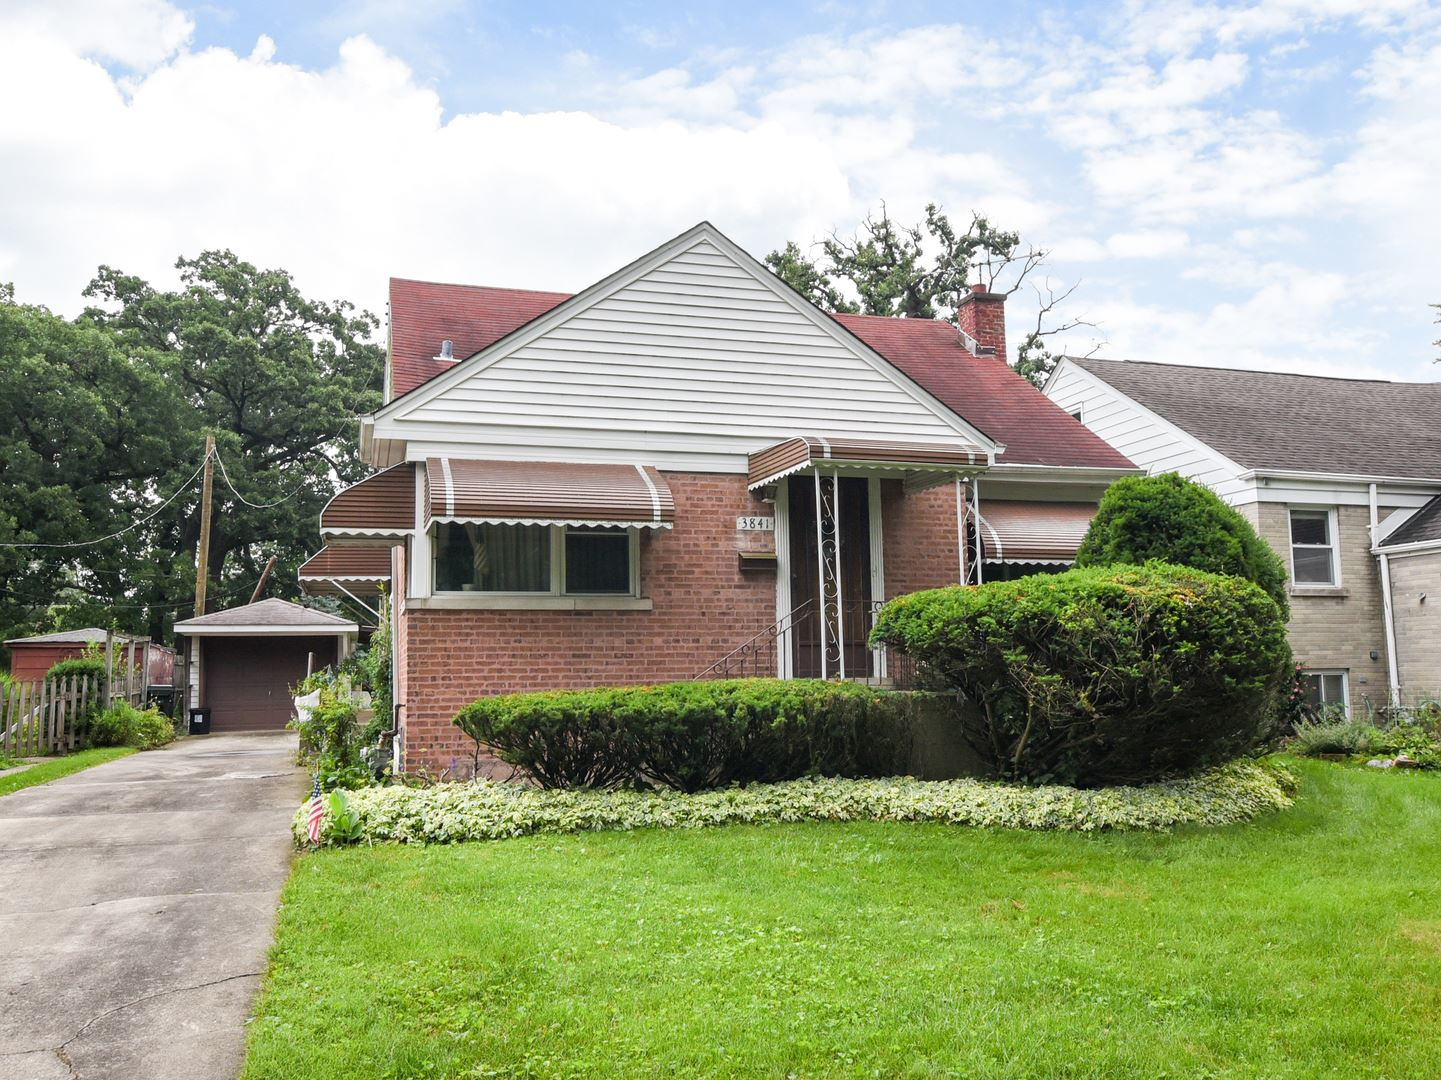 3841 Arden Avenue, Brookfield, IL 60513 - #: 11155492